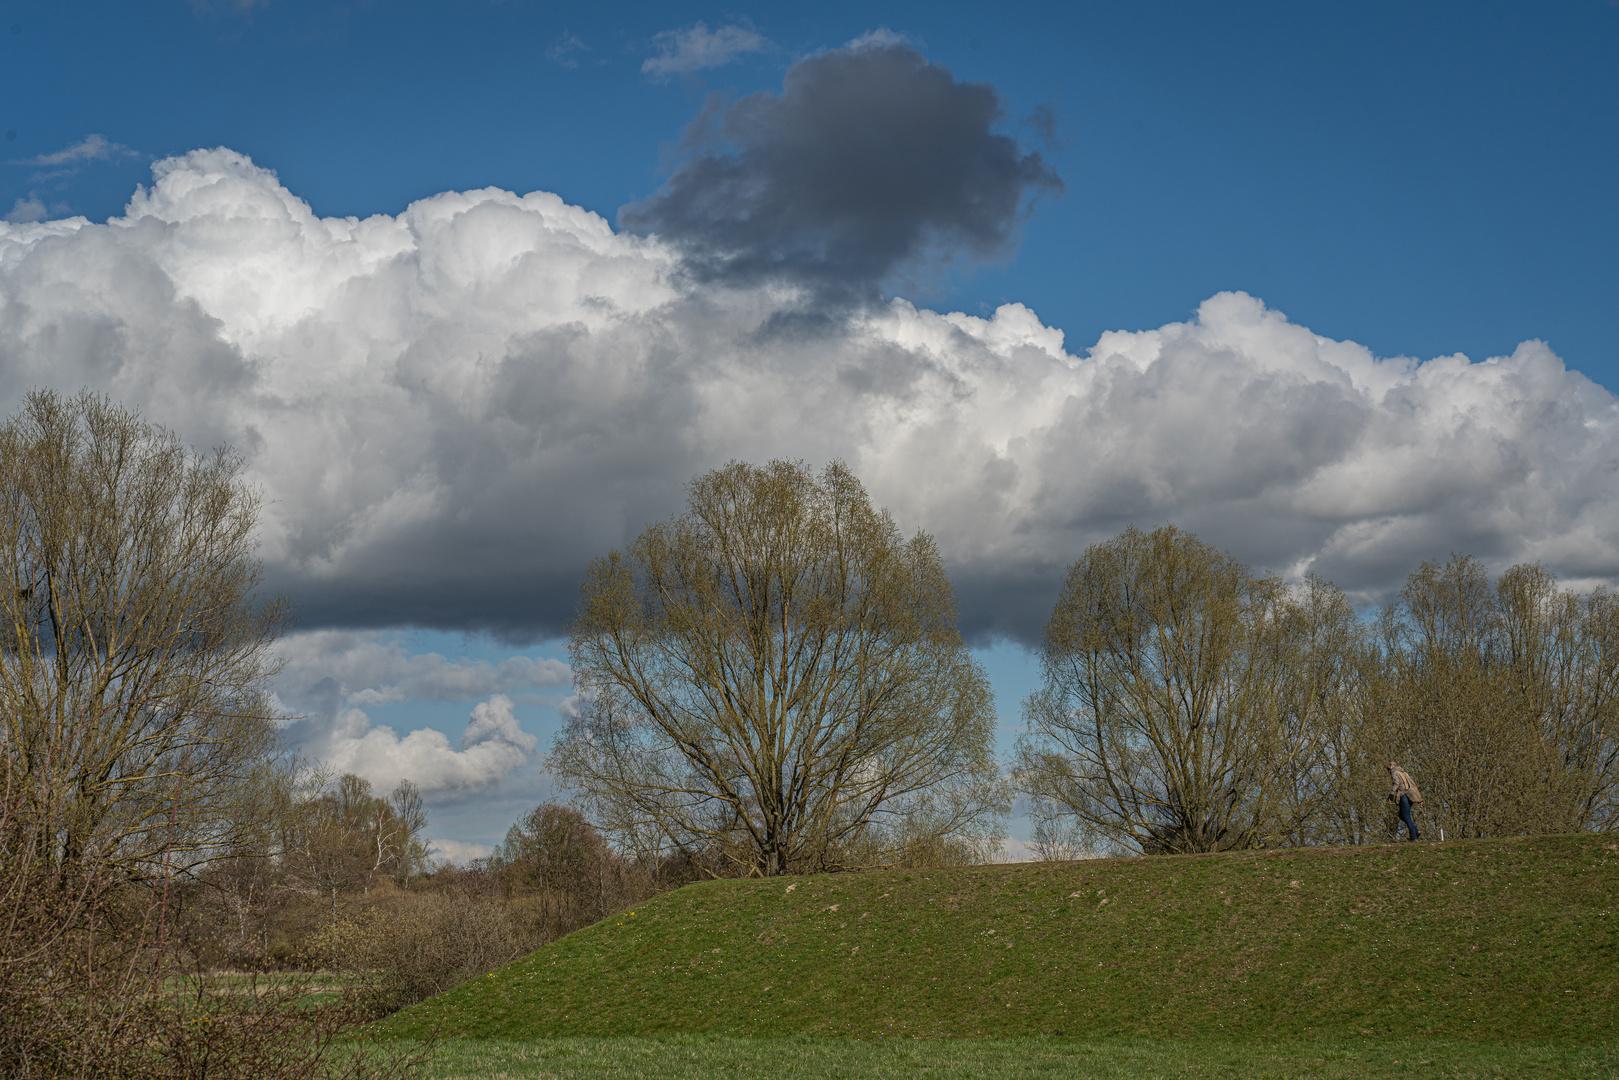 April-Wetter II